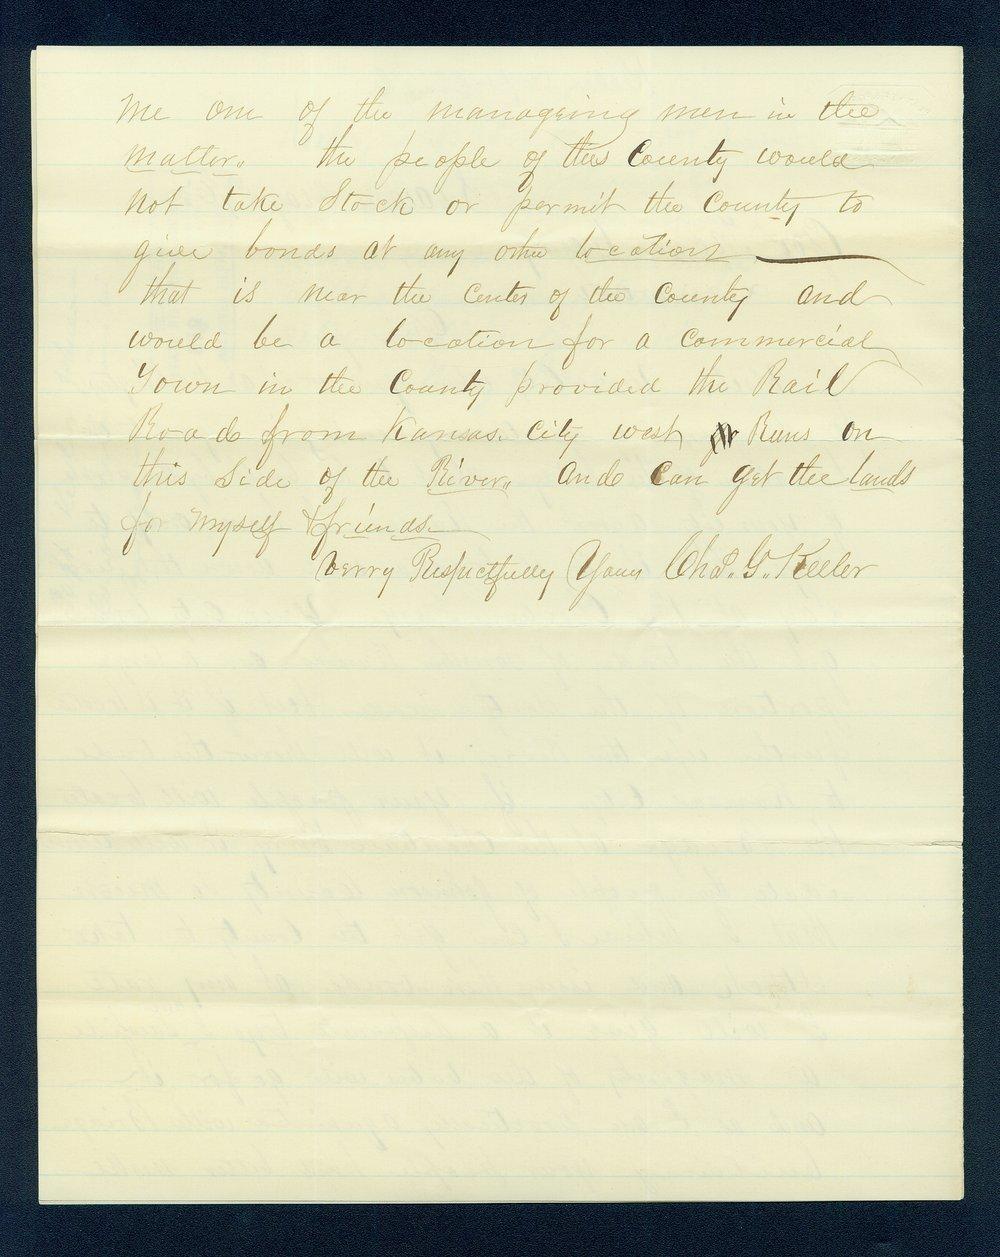 Charles Keeler to Governor Thomas Carney - 2